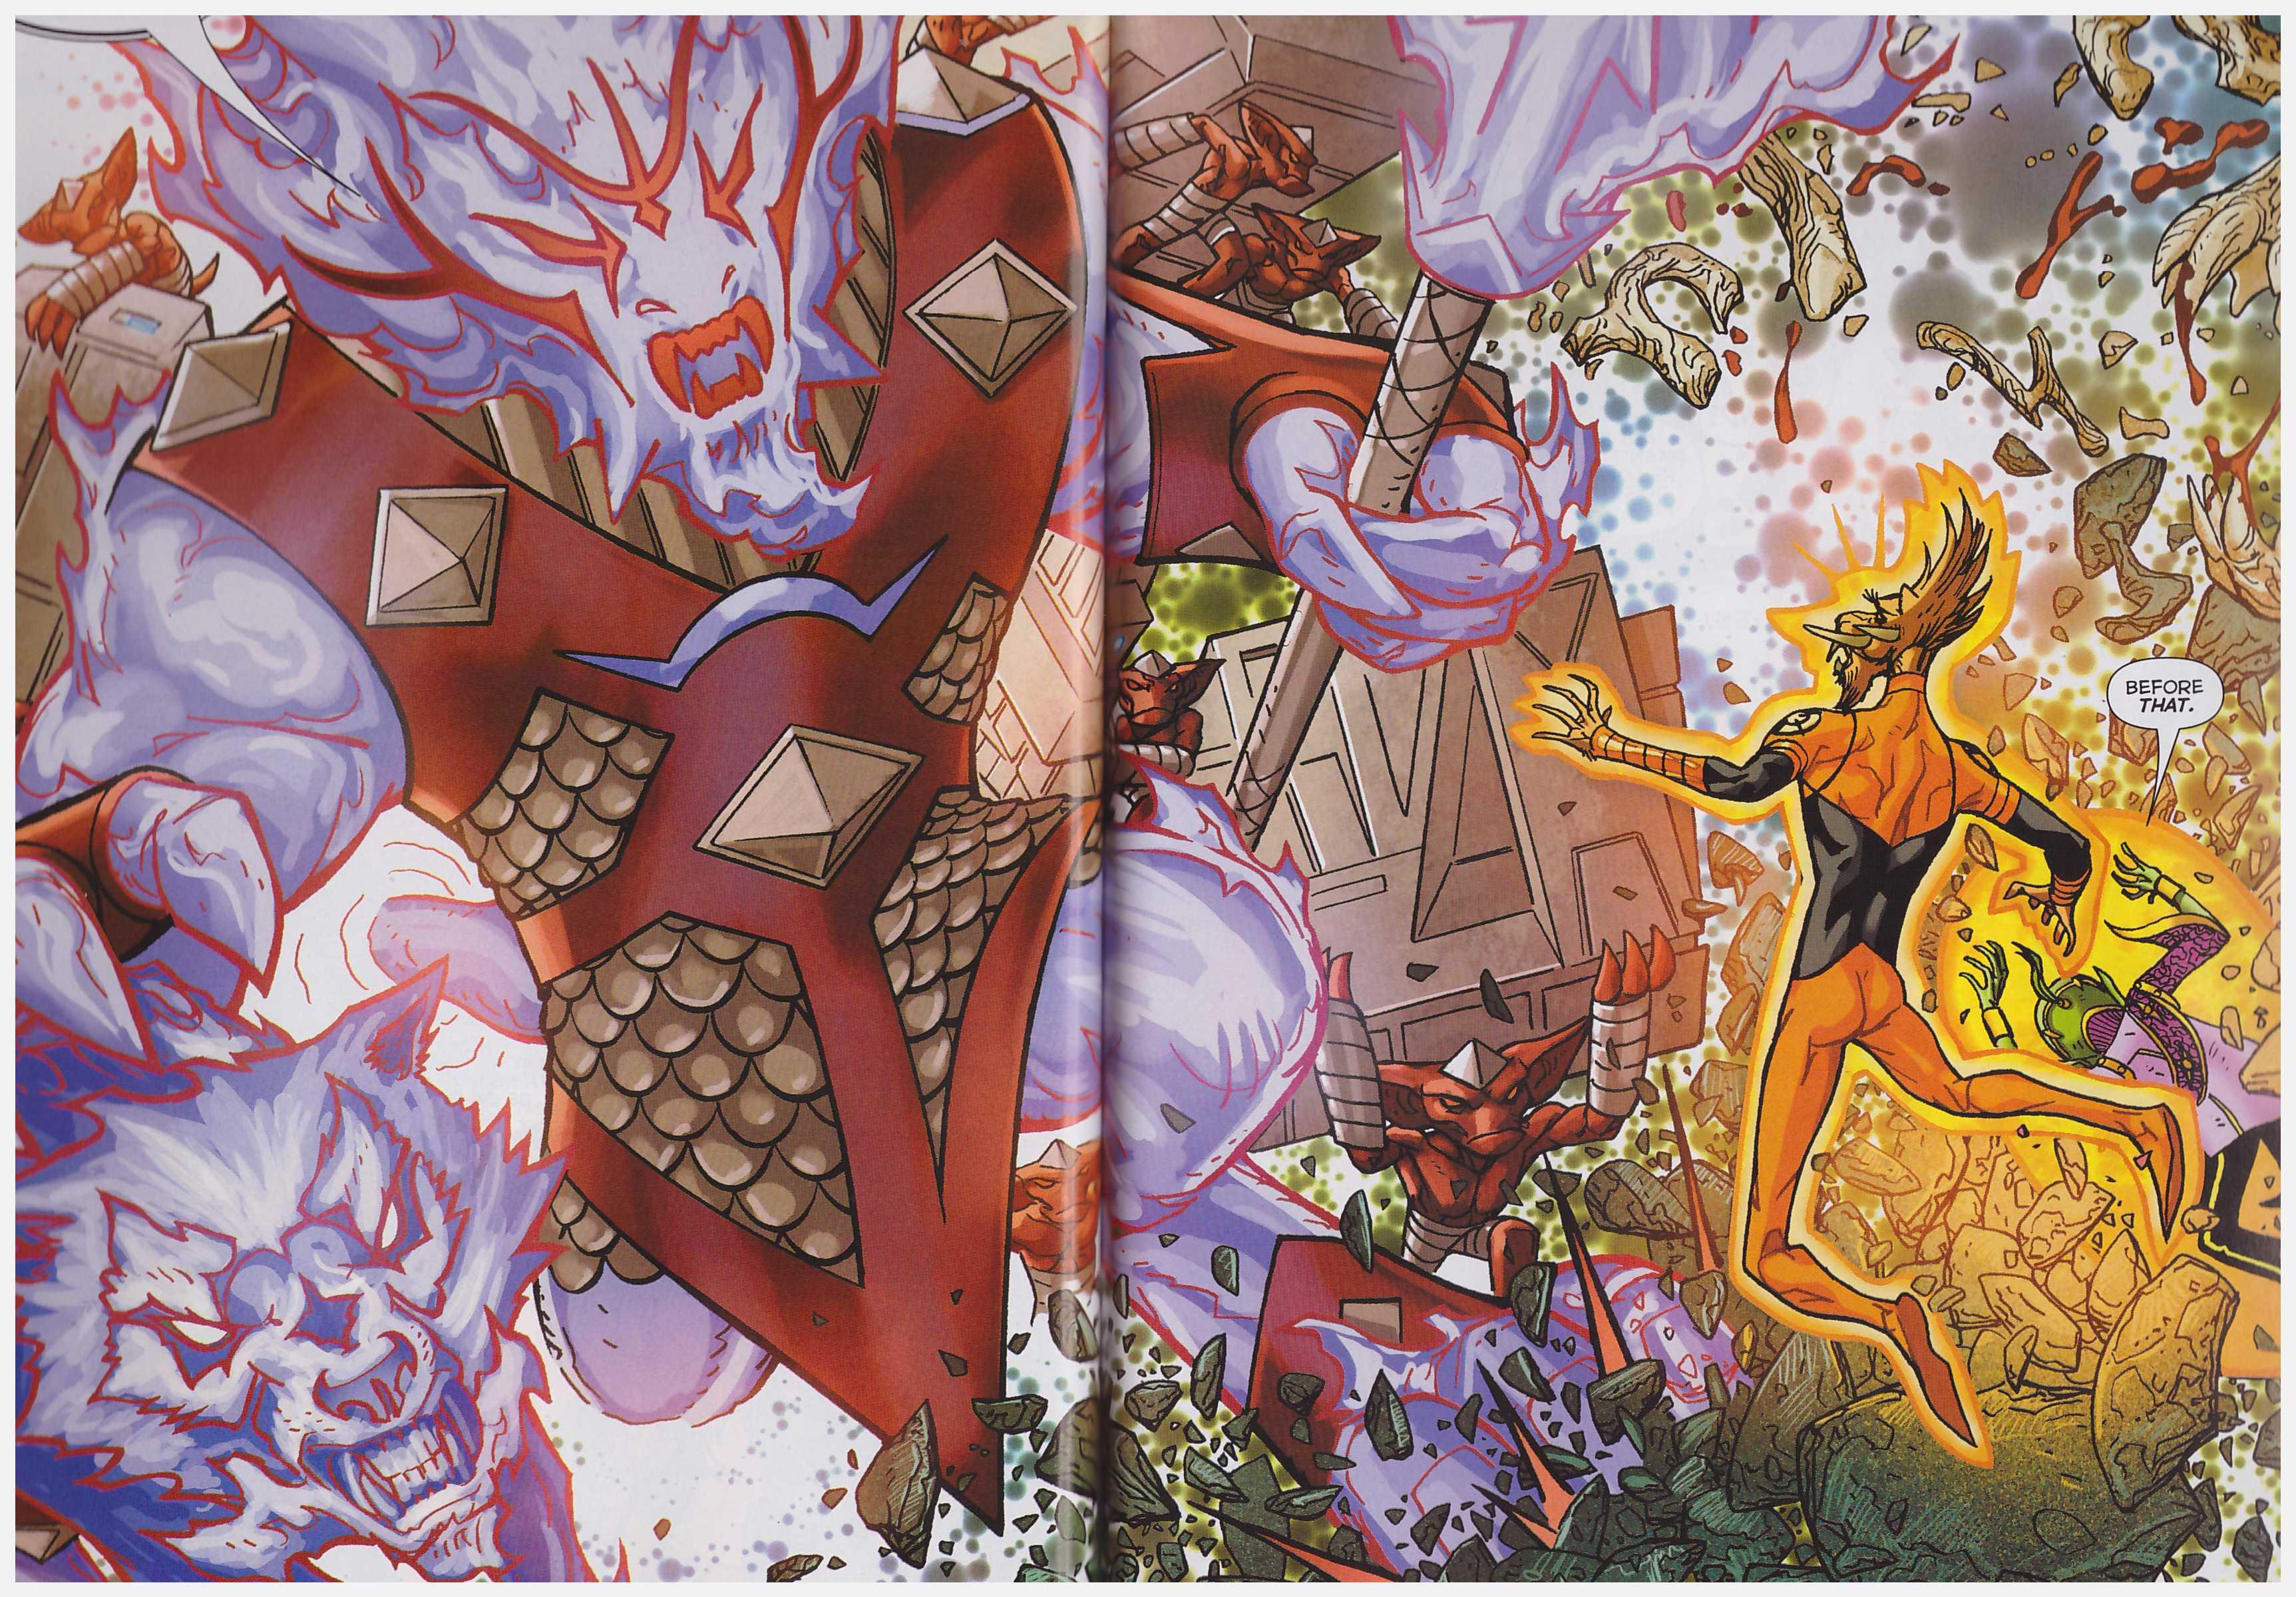 Larfleeze revolt of the Orange Lanterns review